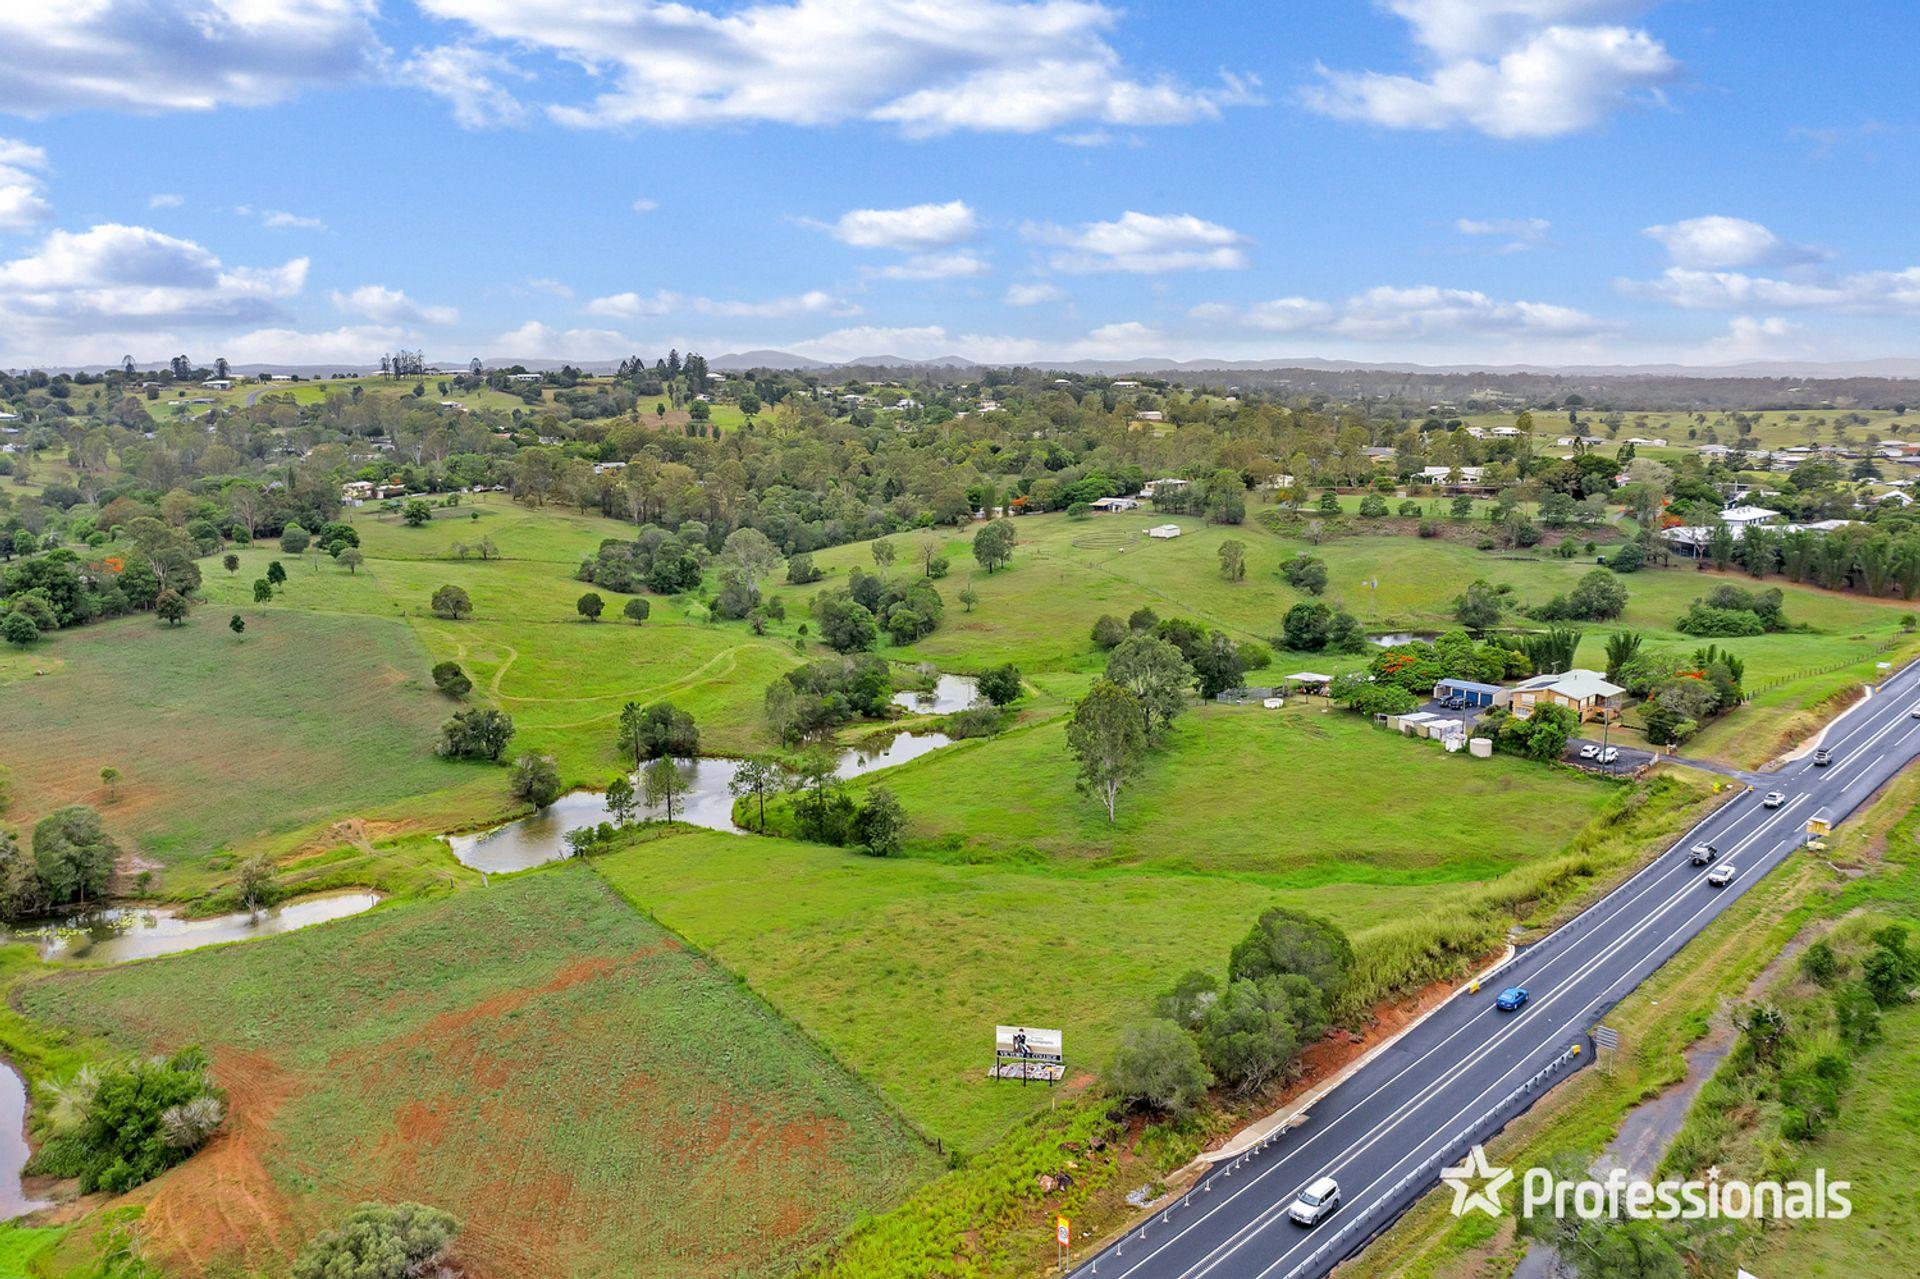 760 Bruce Highway (North) Chatsworth - QLD